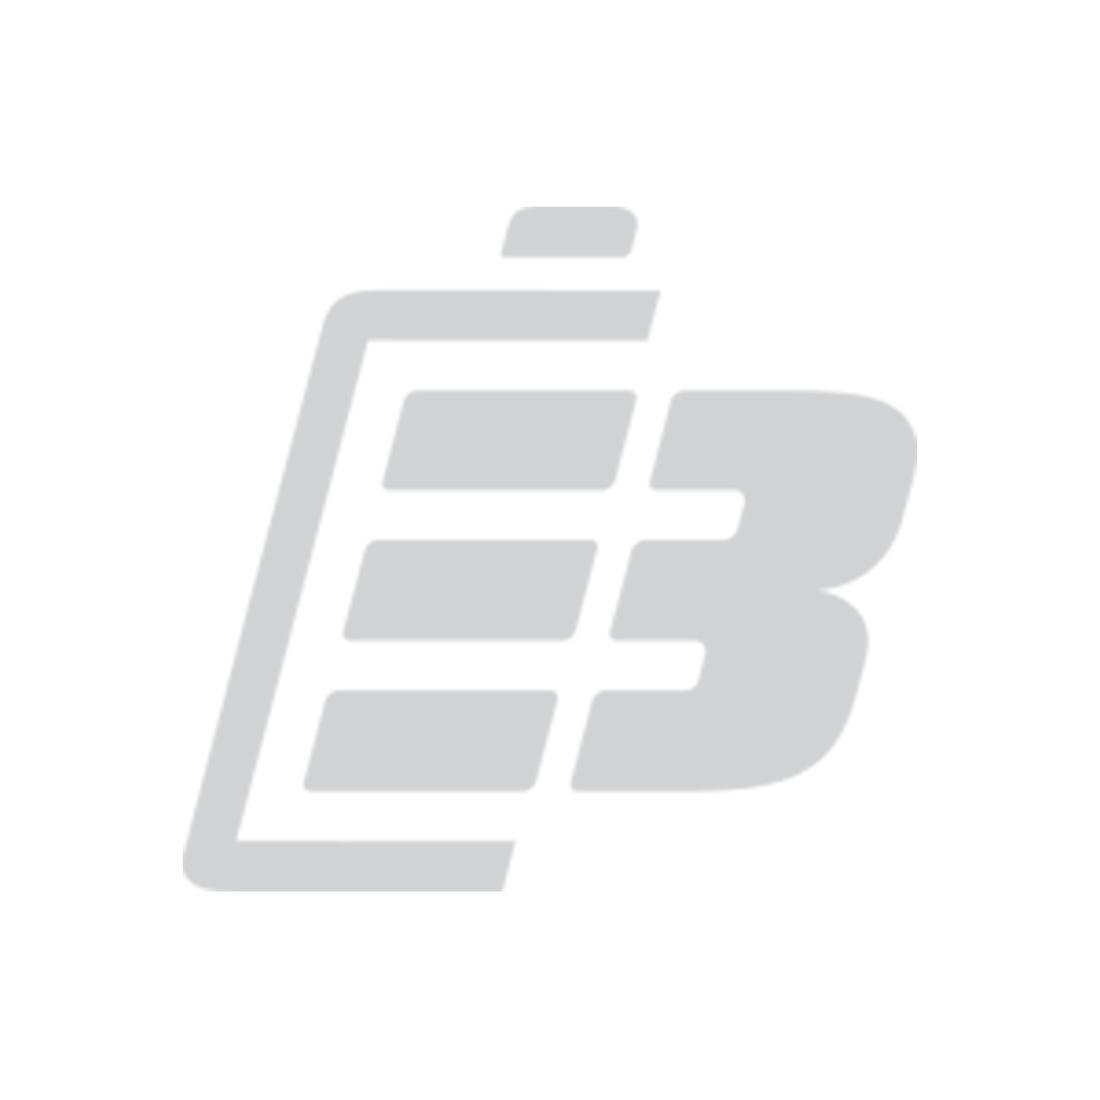 Crane remote control battery Itowa Combi Caja Spohn_1